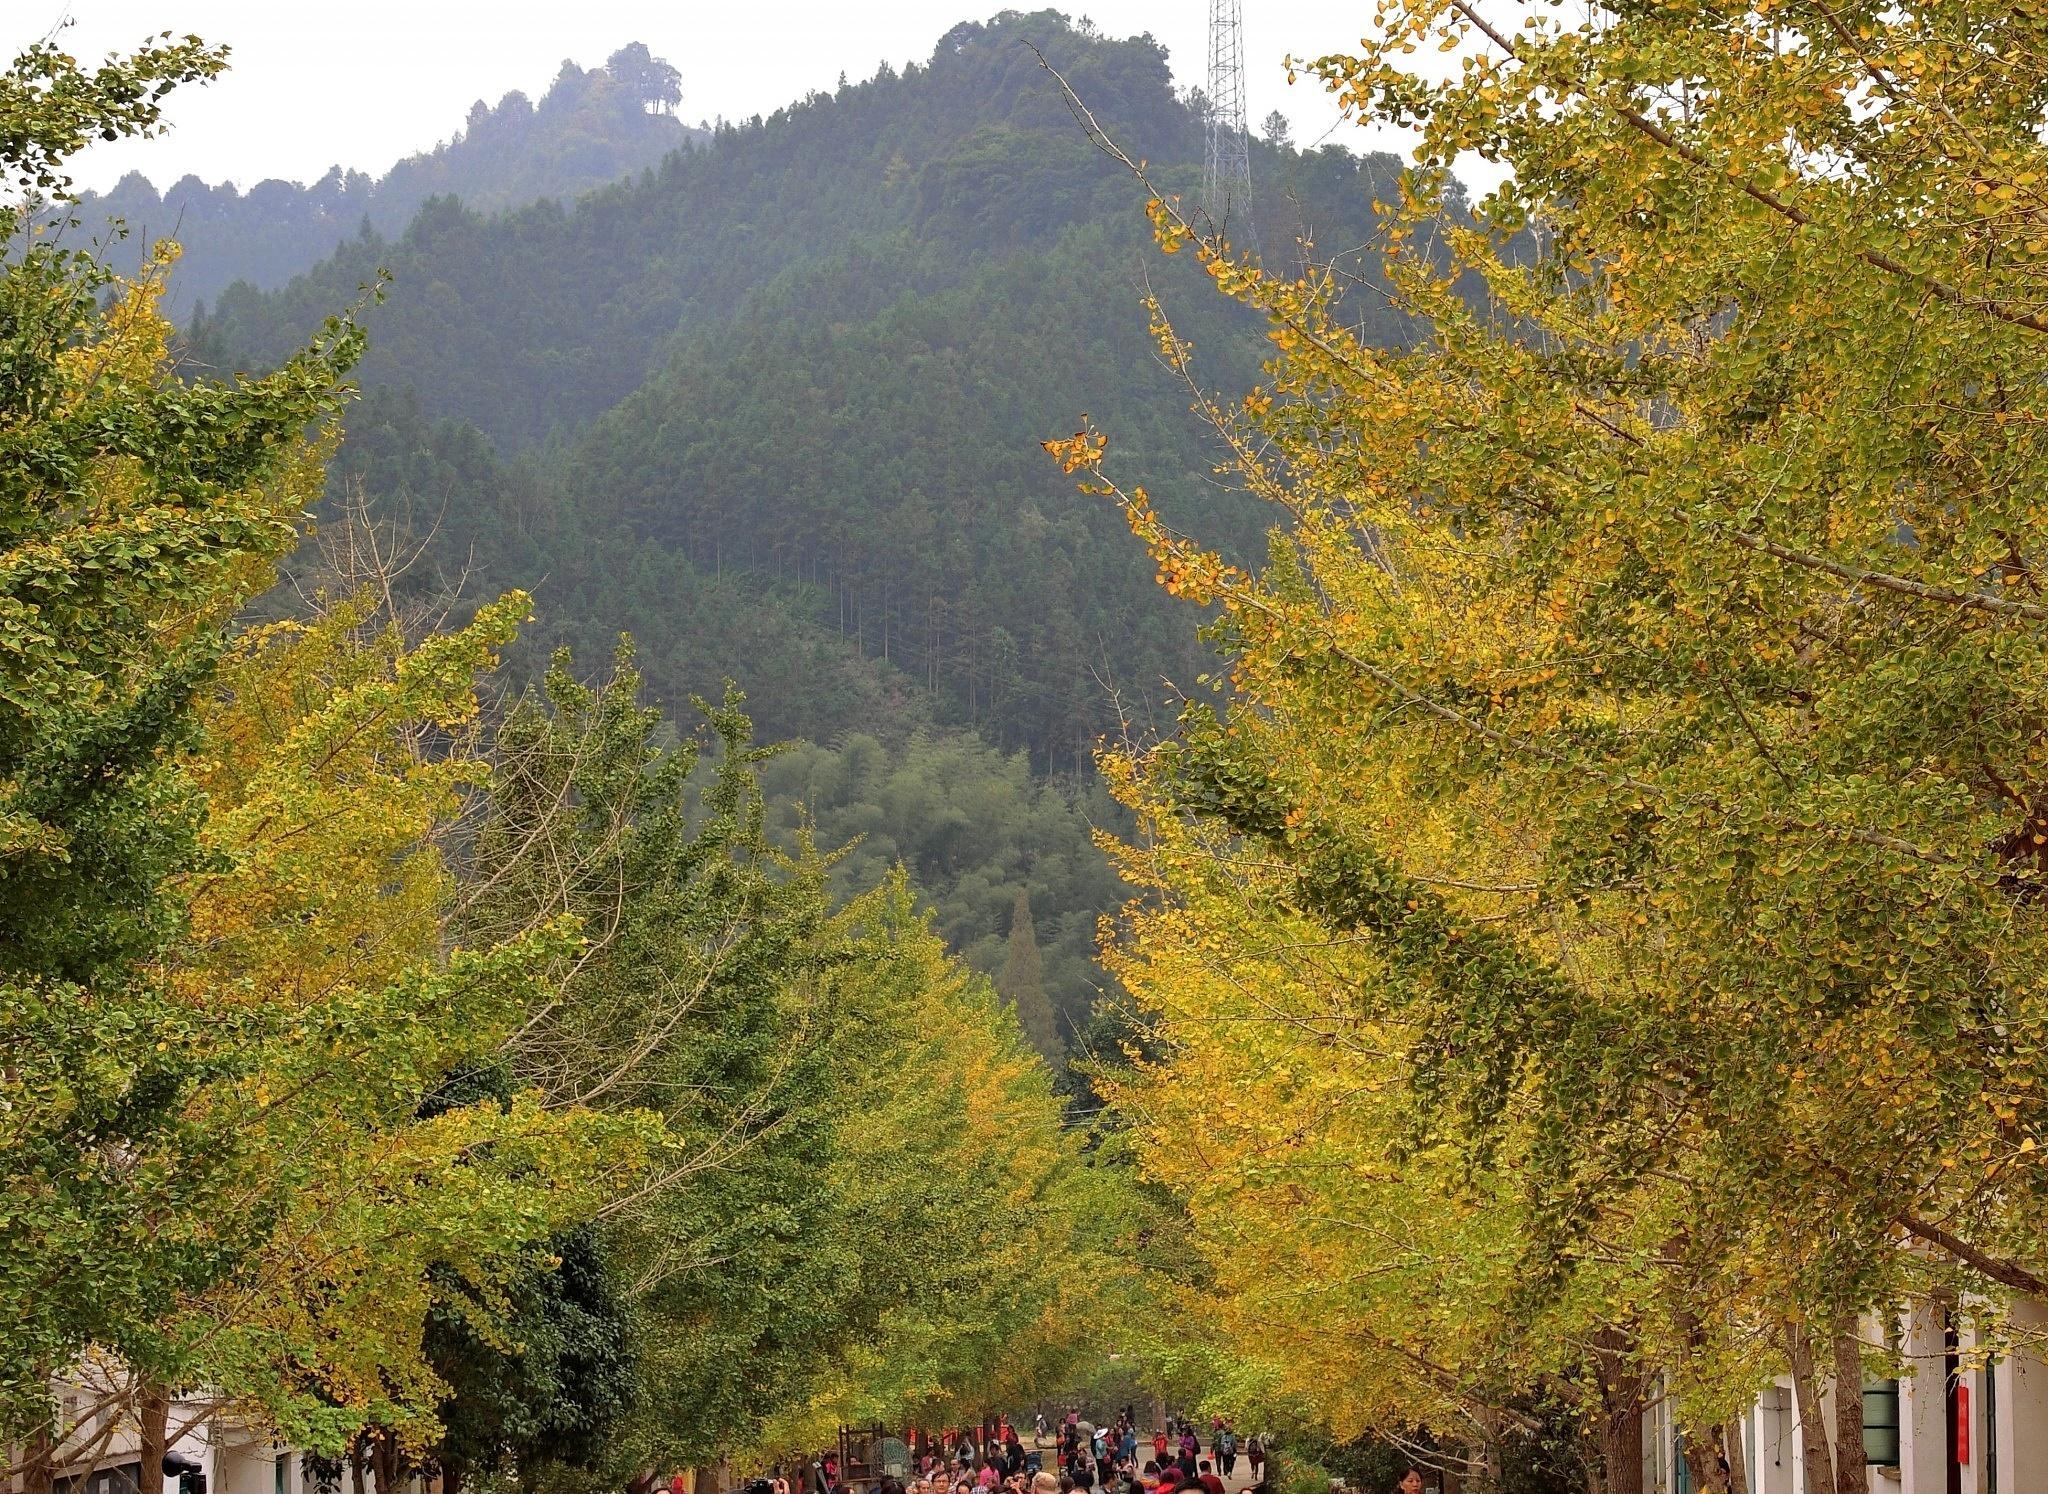 Ginkgo trees, Nanxiong, Shaoguan by pop88123